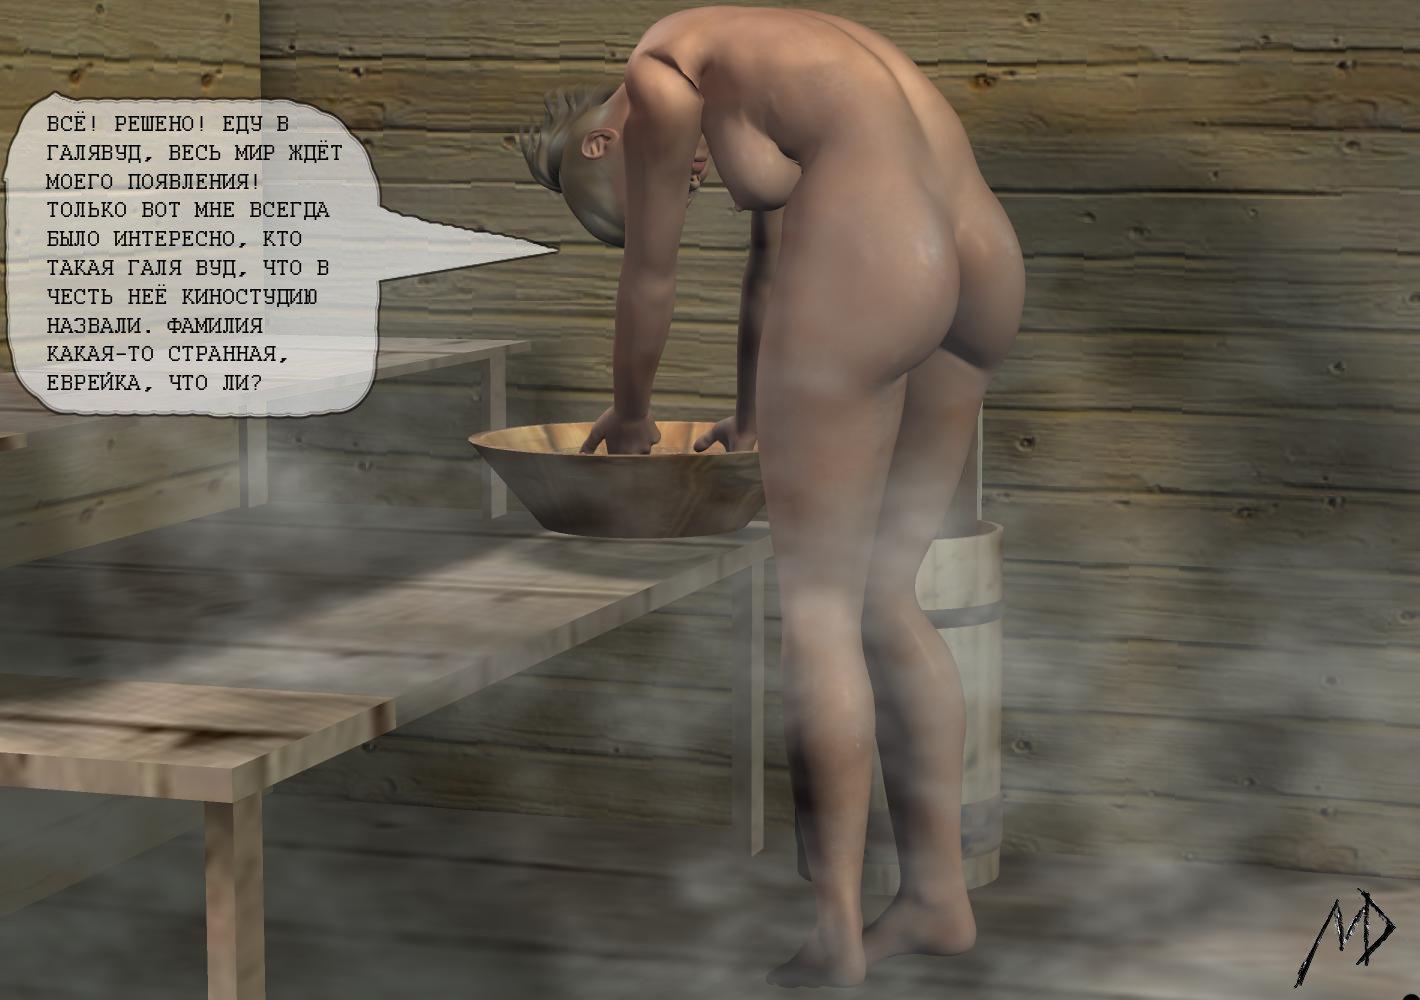 Эро рассказ инцест баня 5 фотография